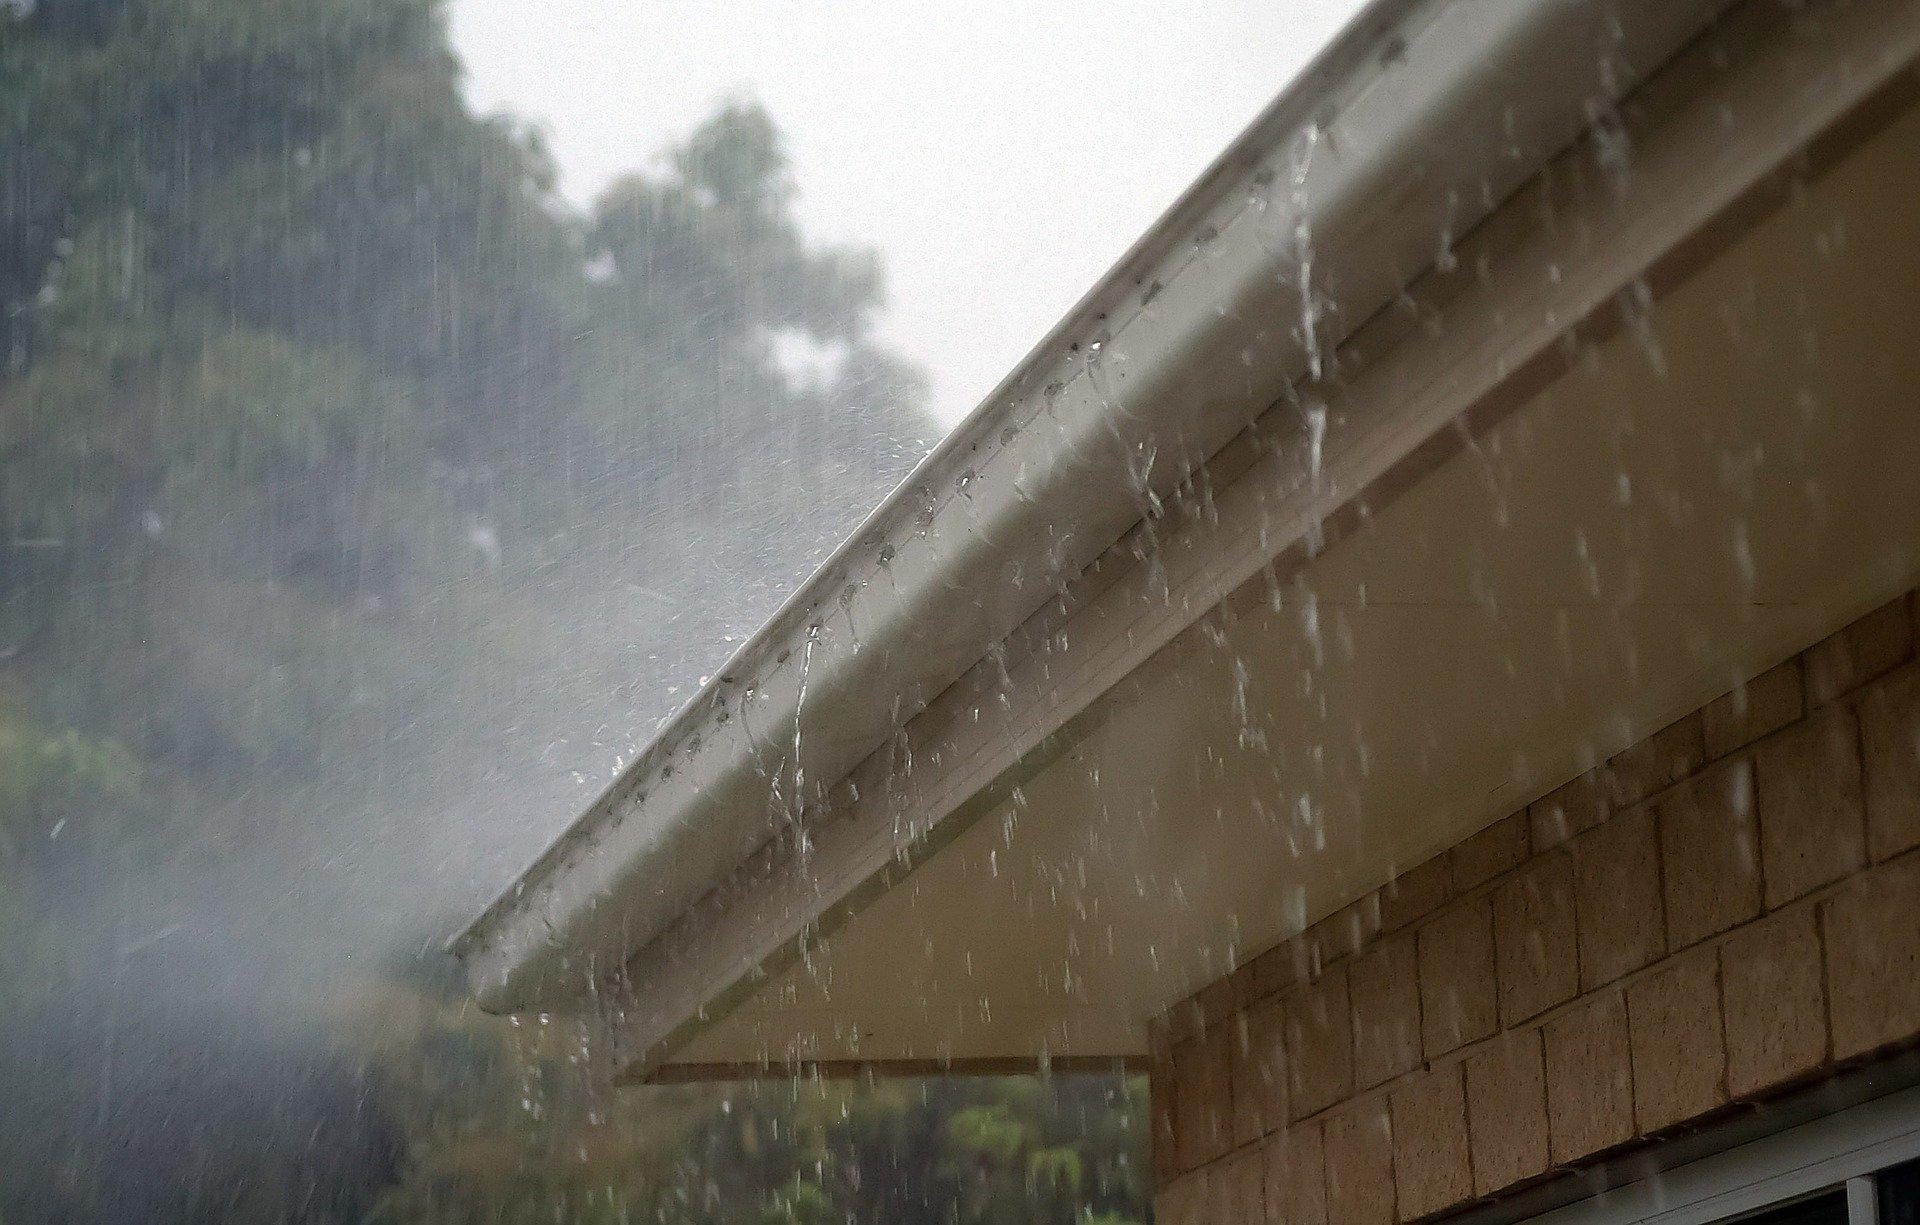 Rain falling down onto a white house gutter